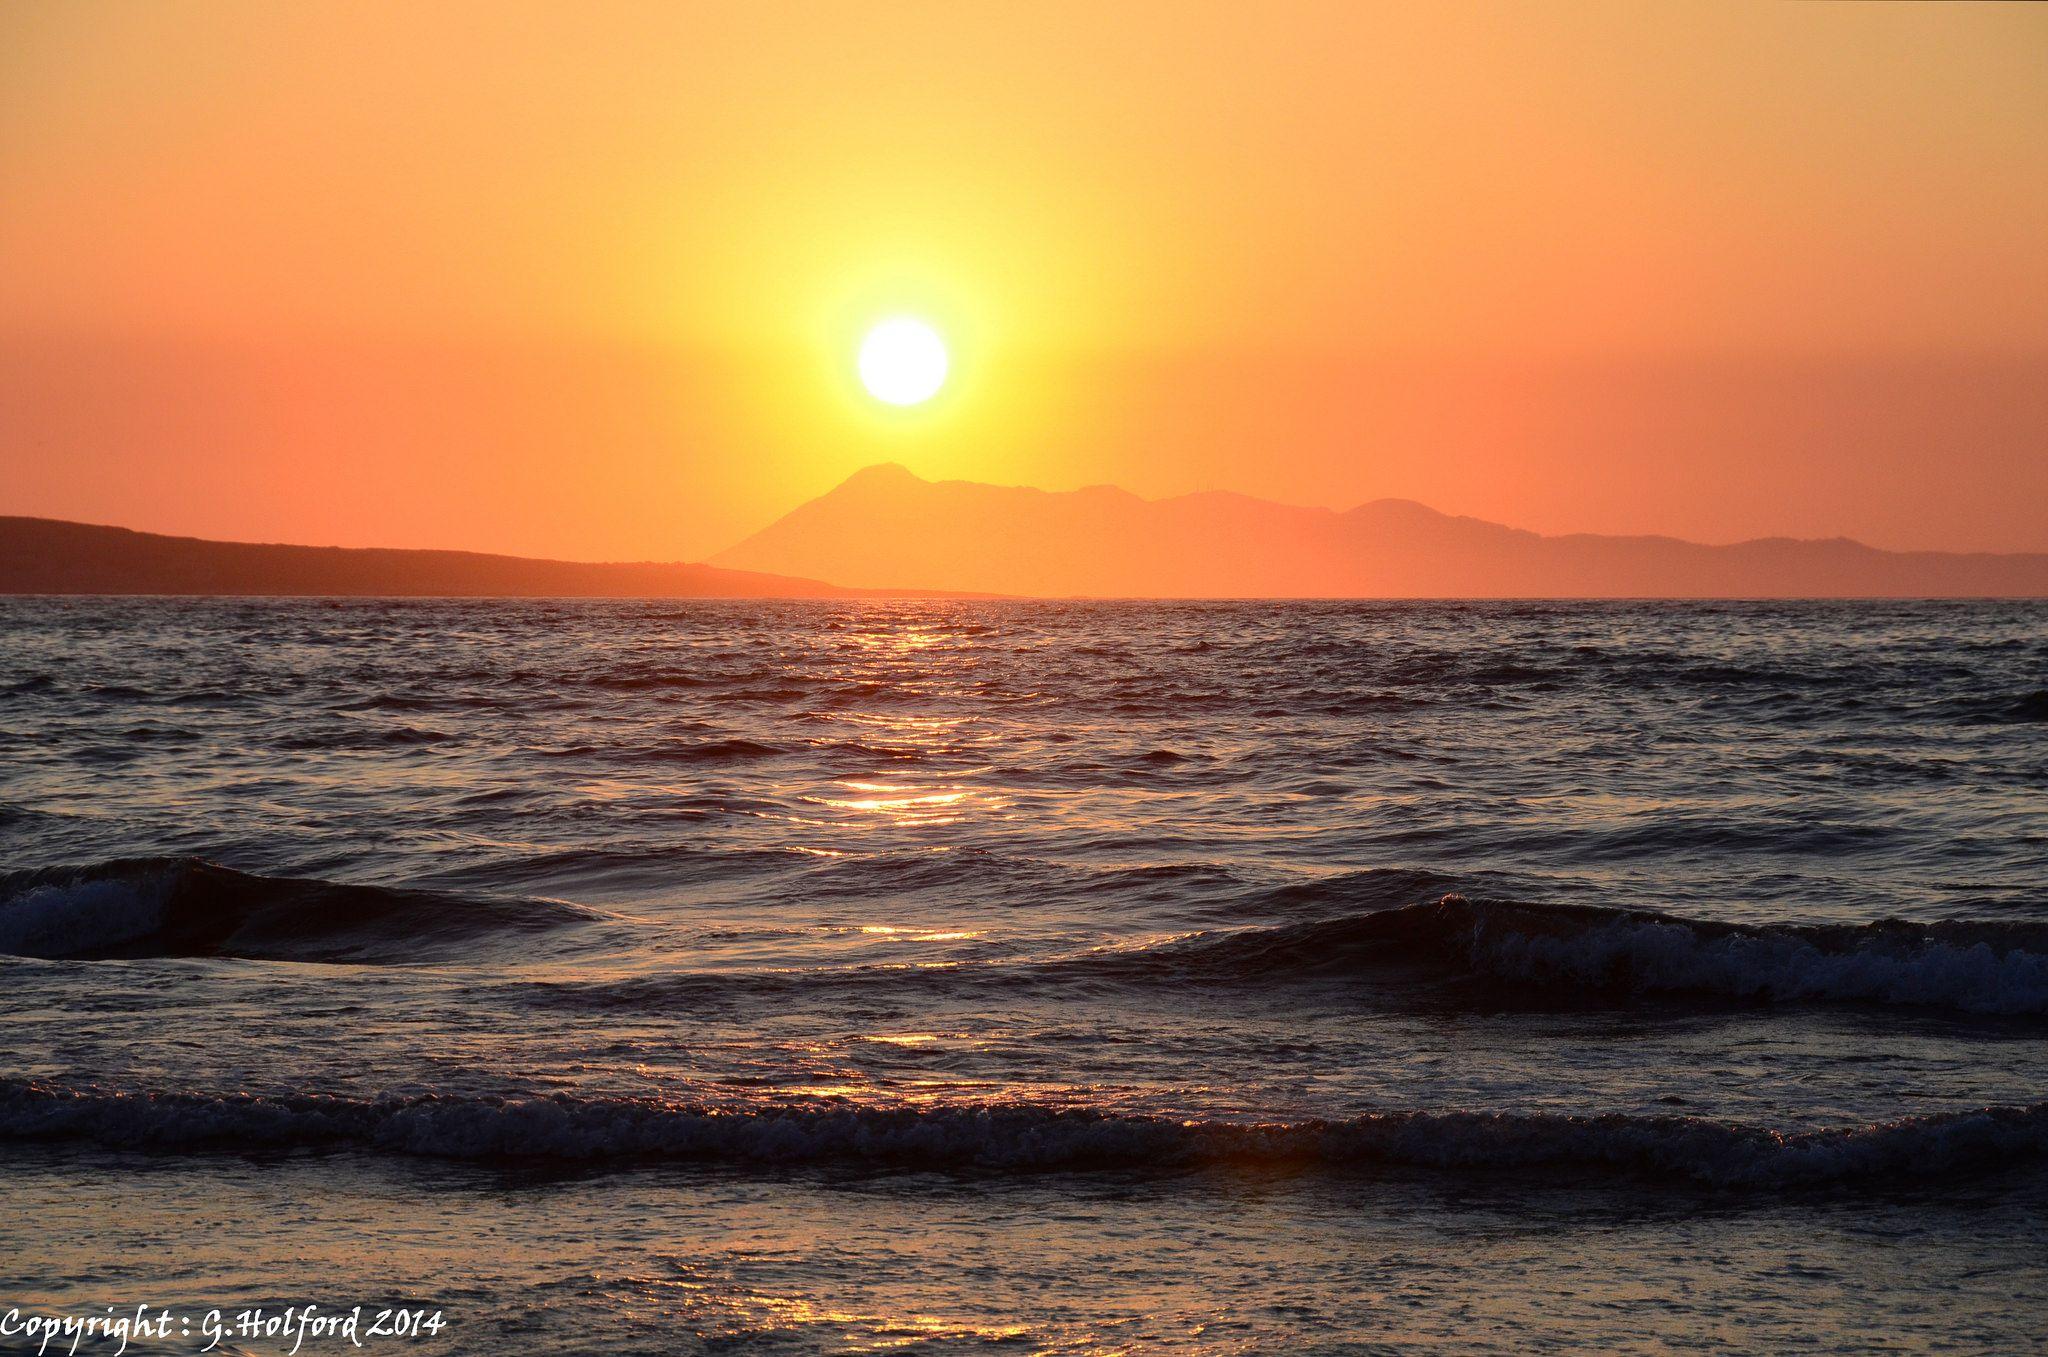 Sunset over Ionian Sea, Agios Stefanos, Peloponnese Western Greece, Ionian Island_ Greece